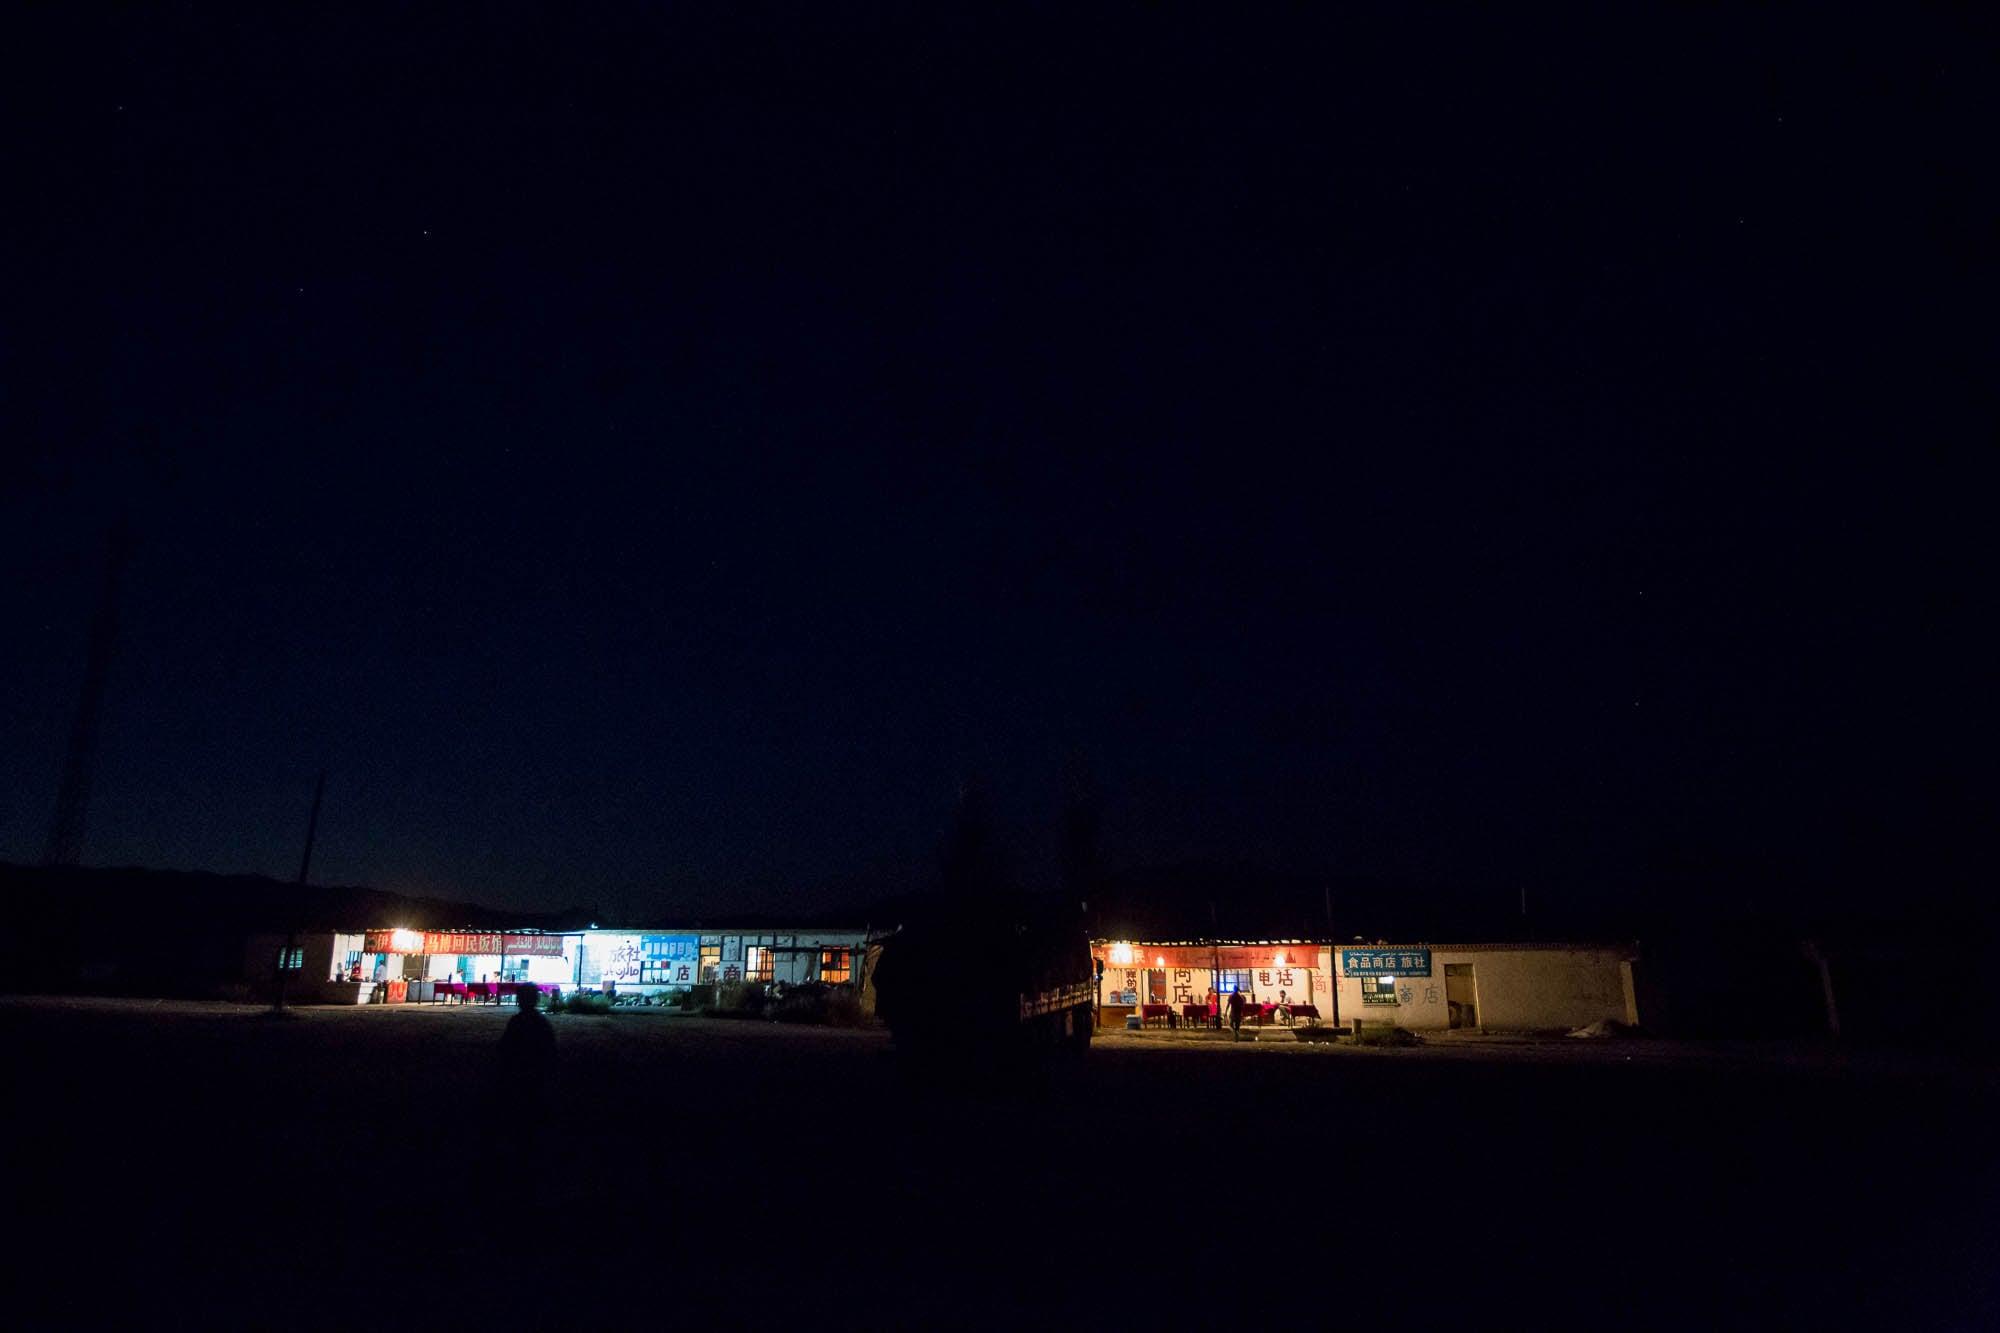 Sitai at night